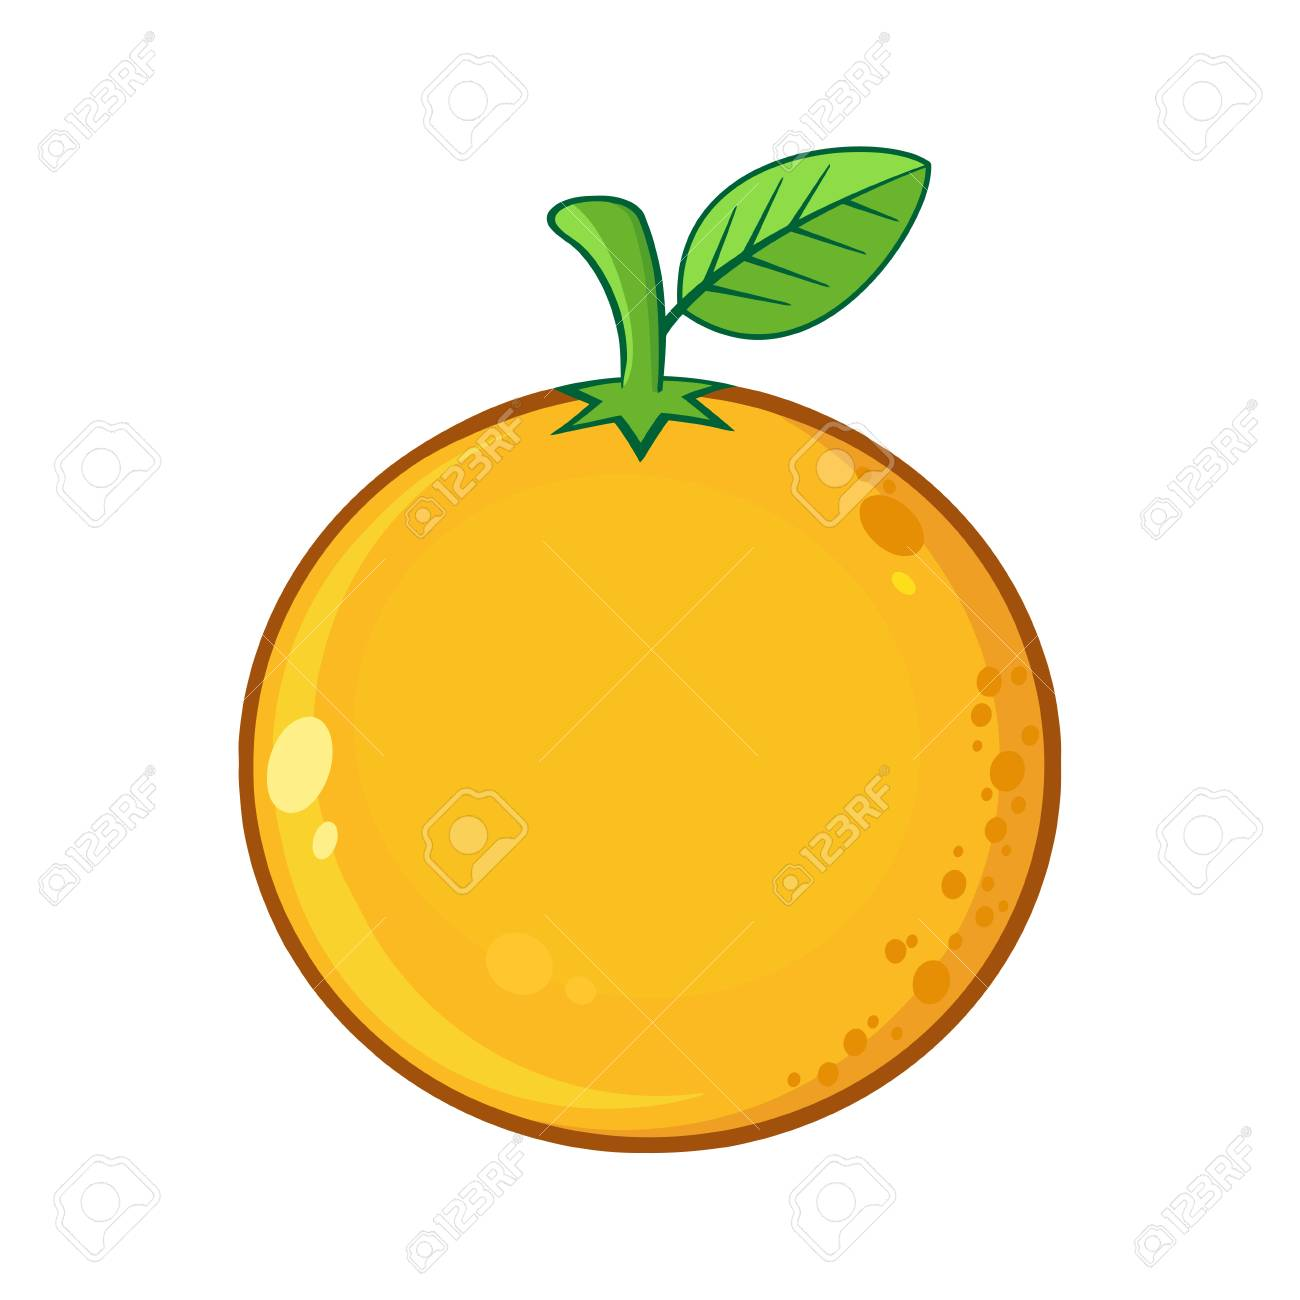 Orange Fresh Fruit With Green Leaf Cartoon Drawing. Illustration ... for Drawing Orange Fruit  289hul